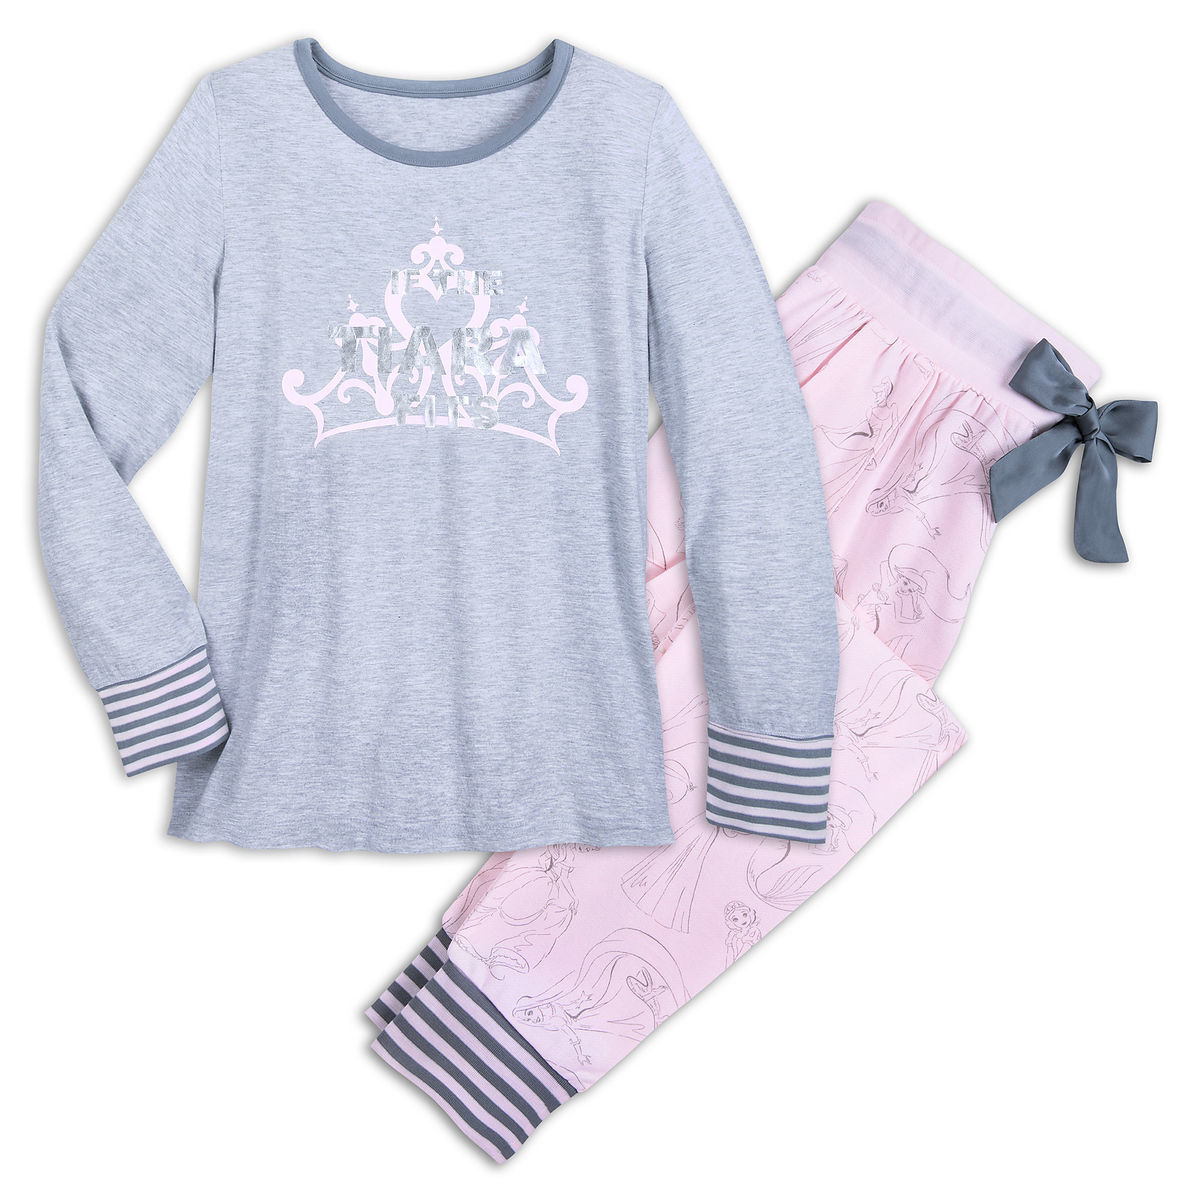 3f85d8766f Product Image of Disney Princess   If The Tiara Fits   PJ Set for